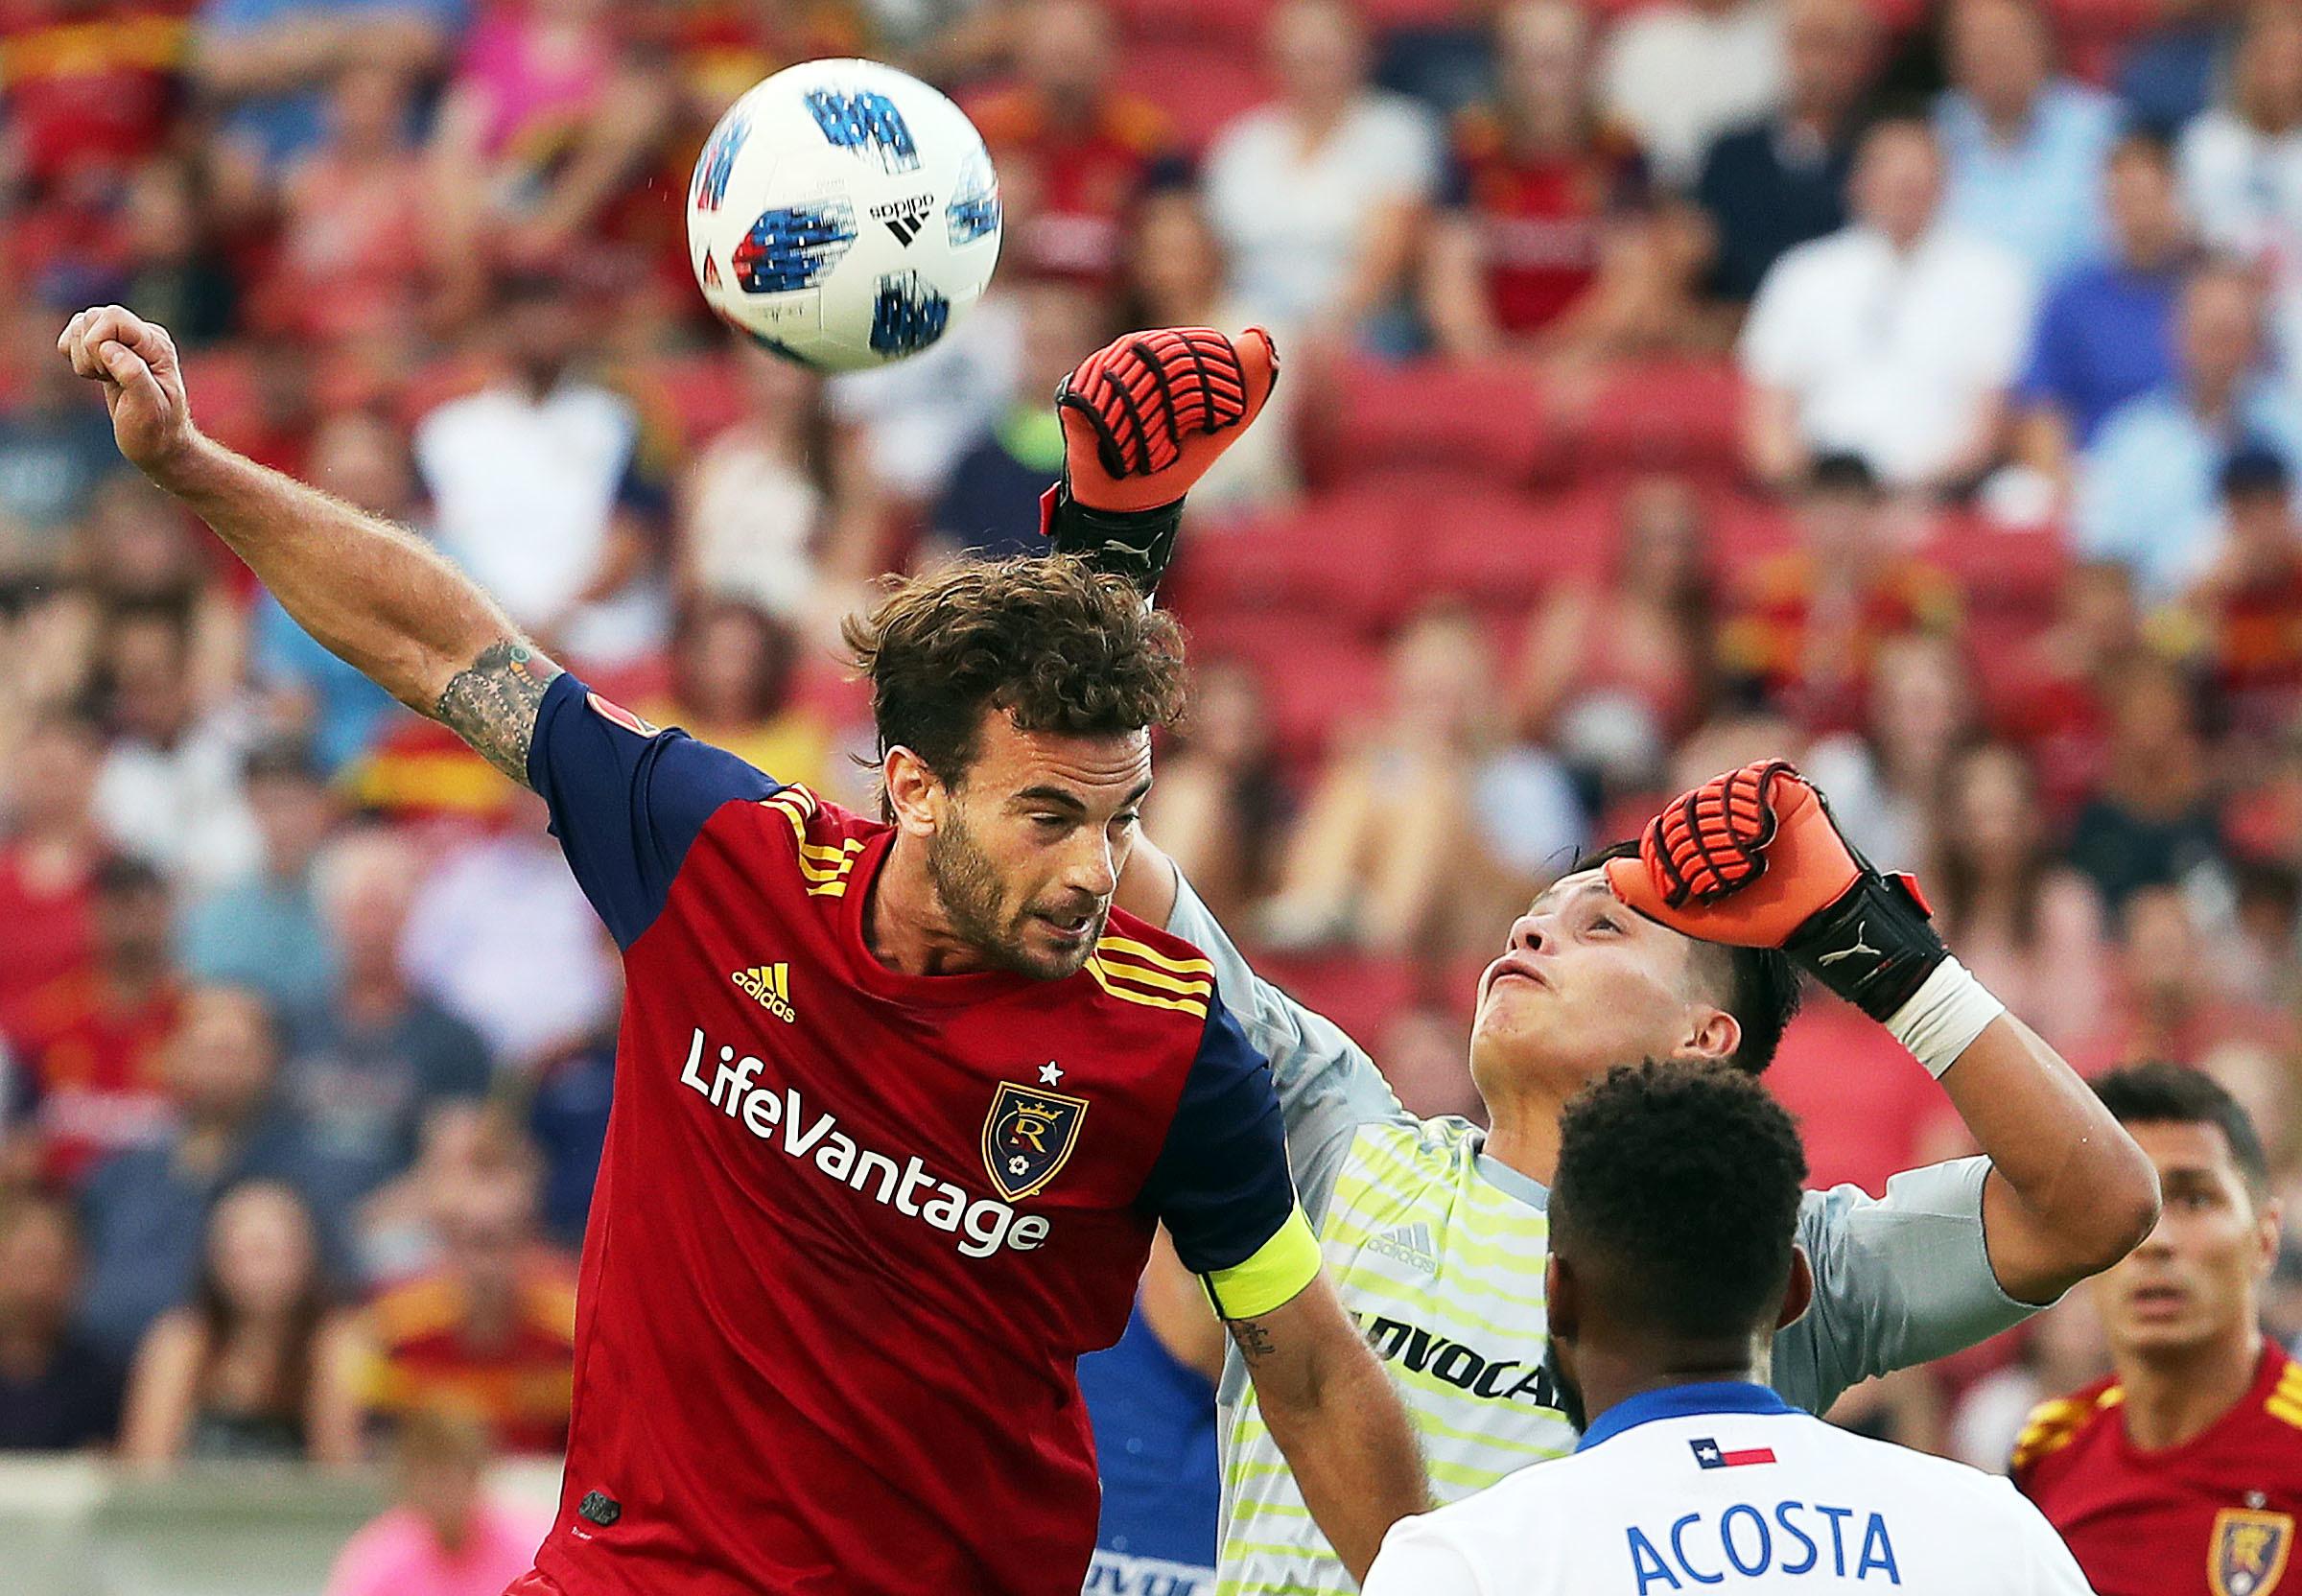 Real Salt Lake midfielder Kyle Beckerman (5) tries for a header against FC Dallas goalkeeper Jesse Gonzalez (1) during MLS soccer in Sandy on Saturday, July 7, 2018.